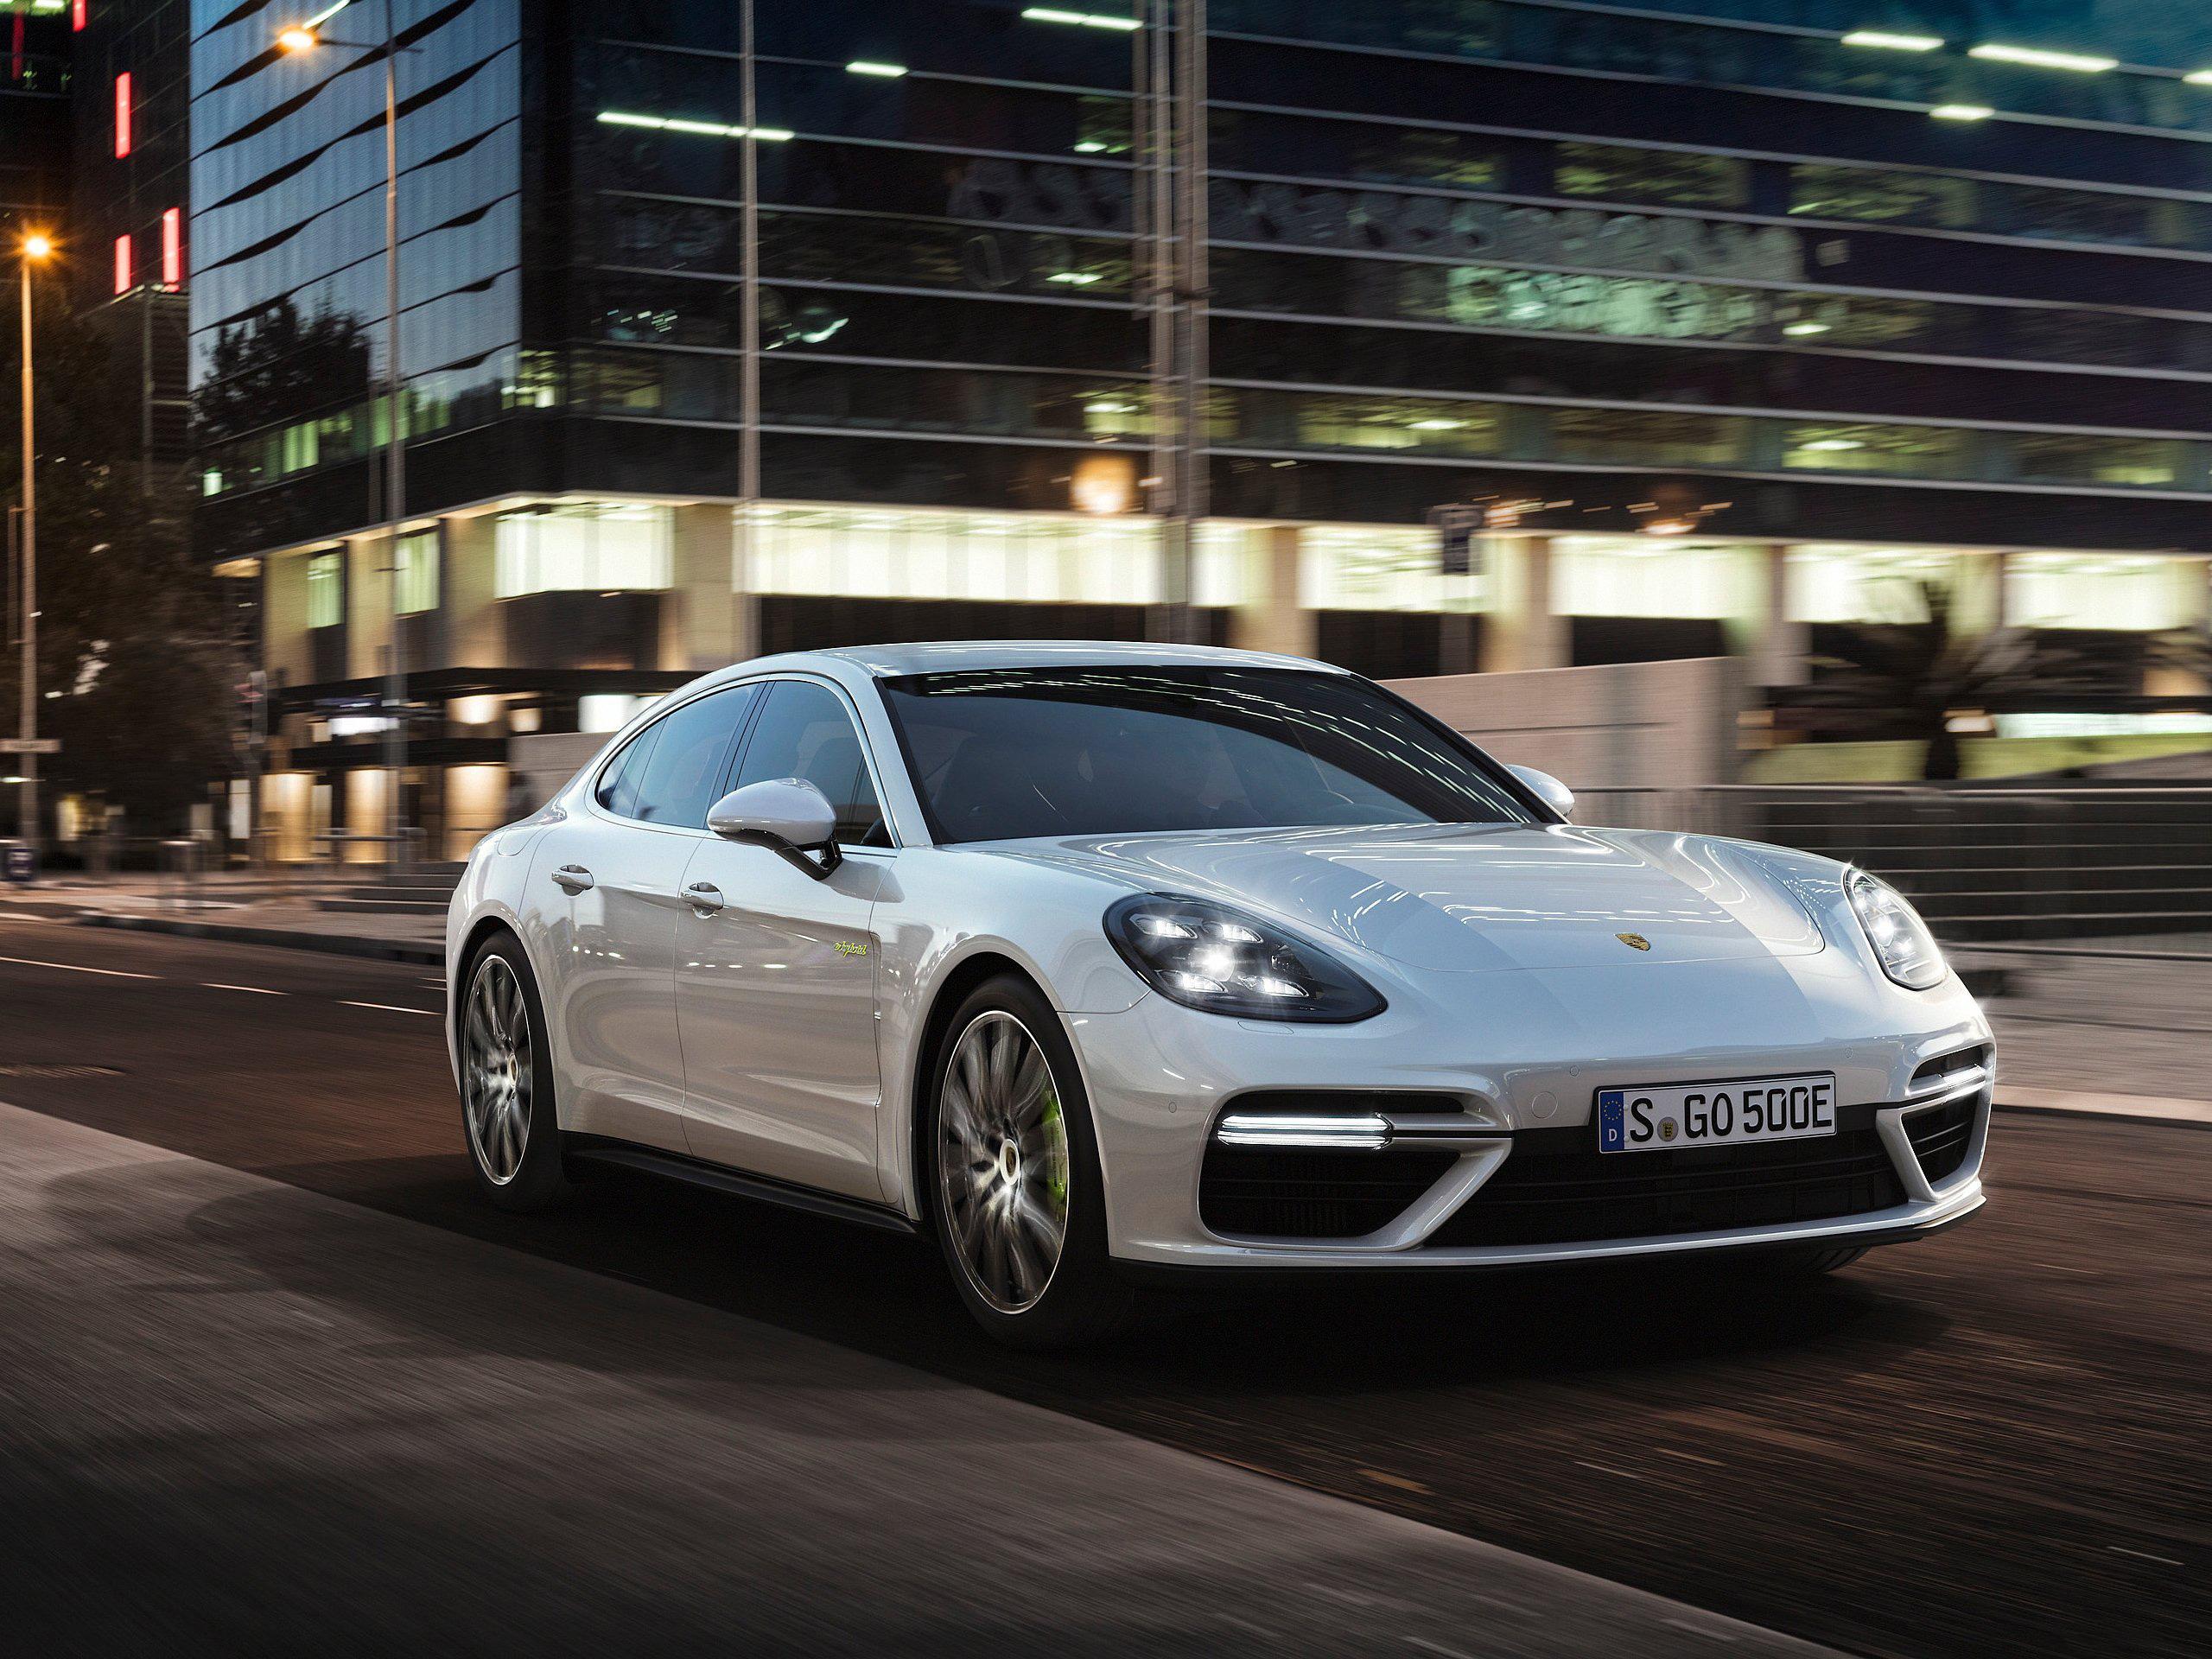 2018 Porsche Panamera Turbo S E Hybrid Hd Cars 4k